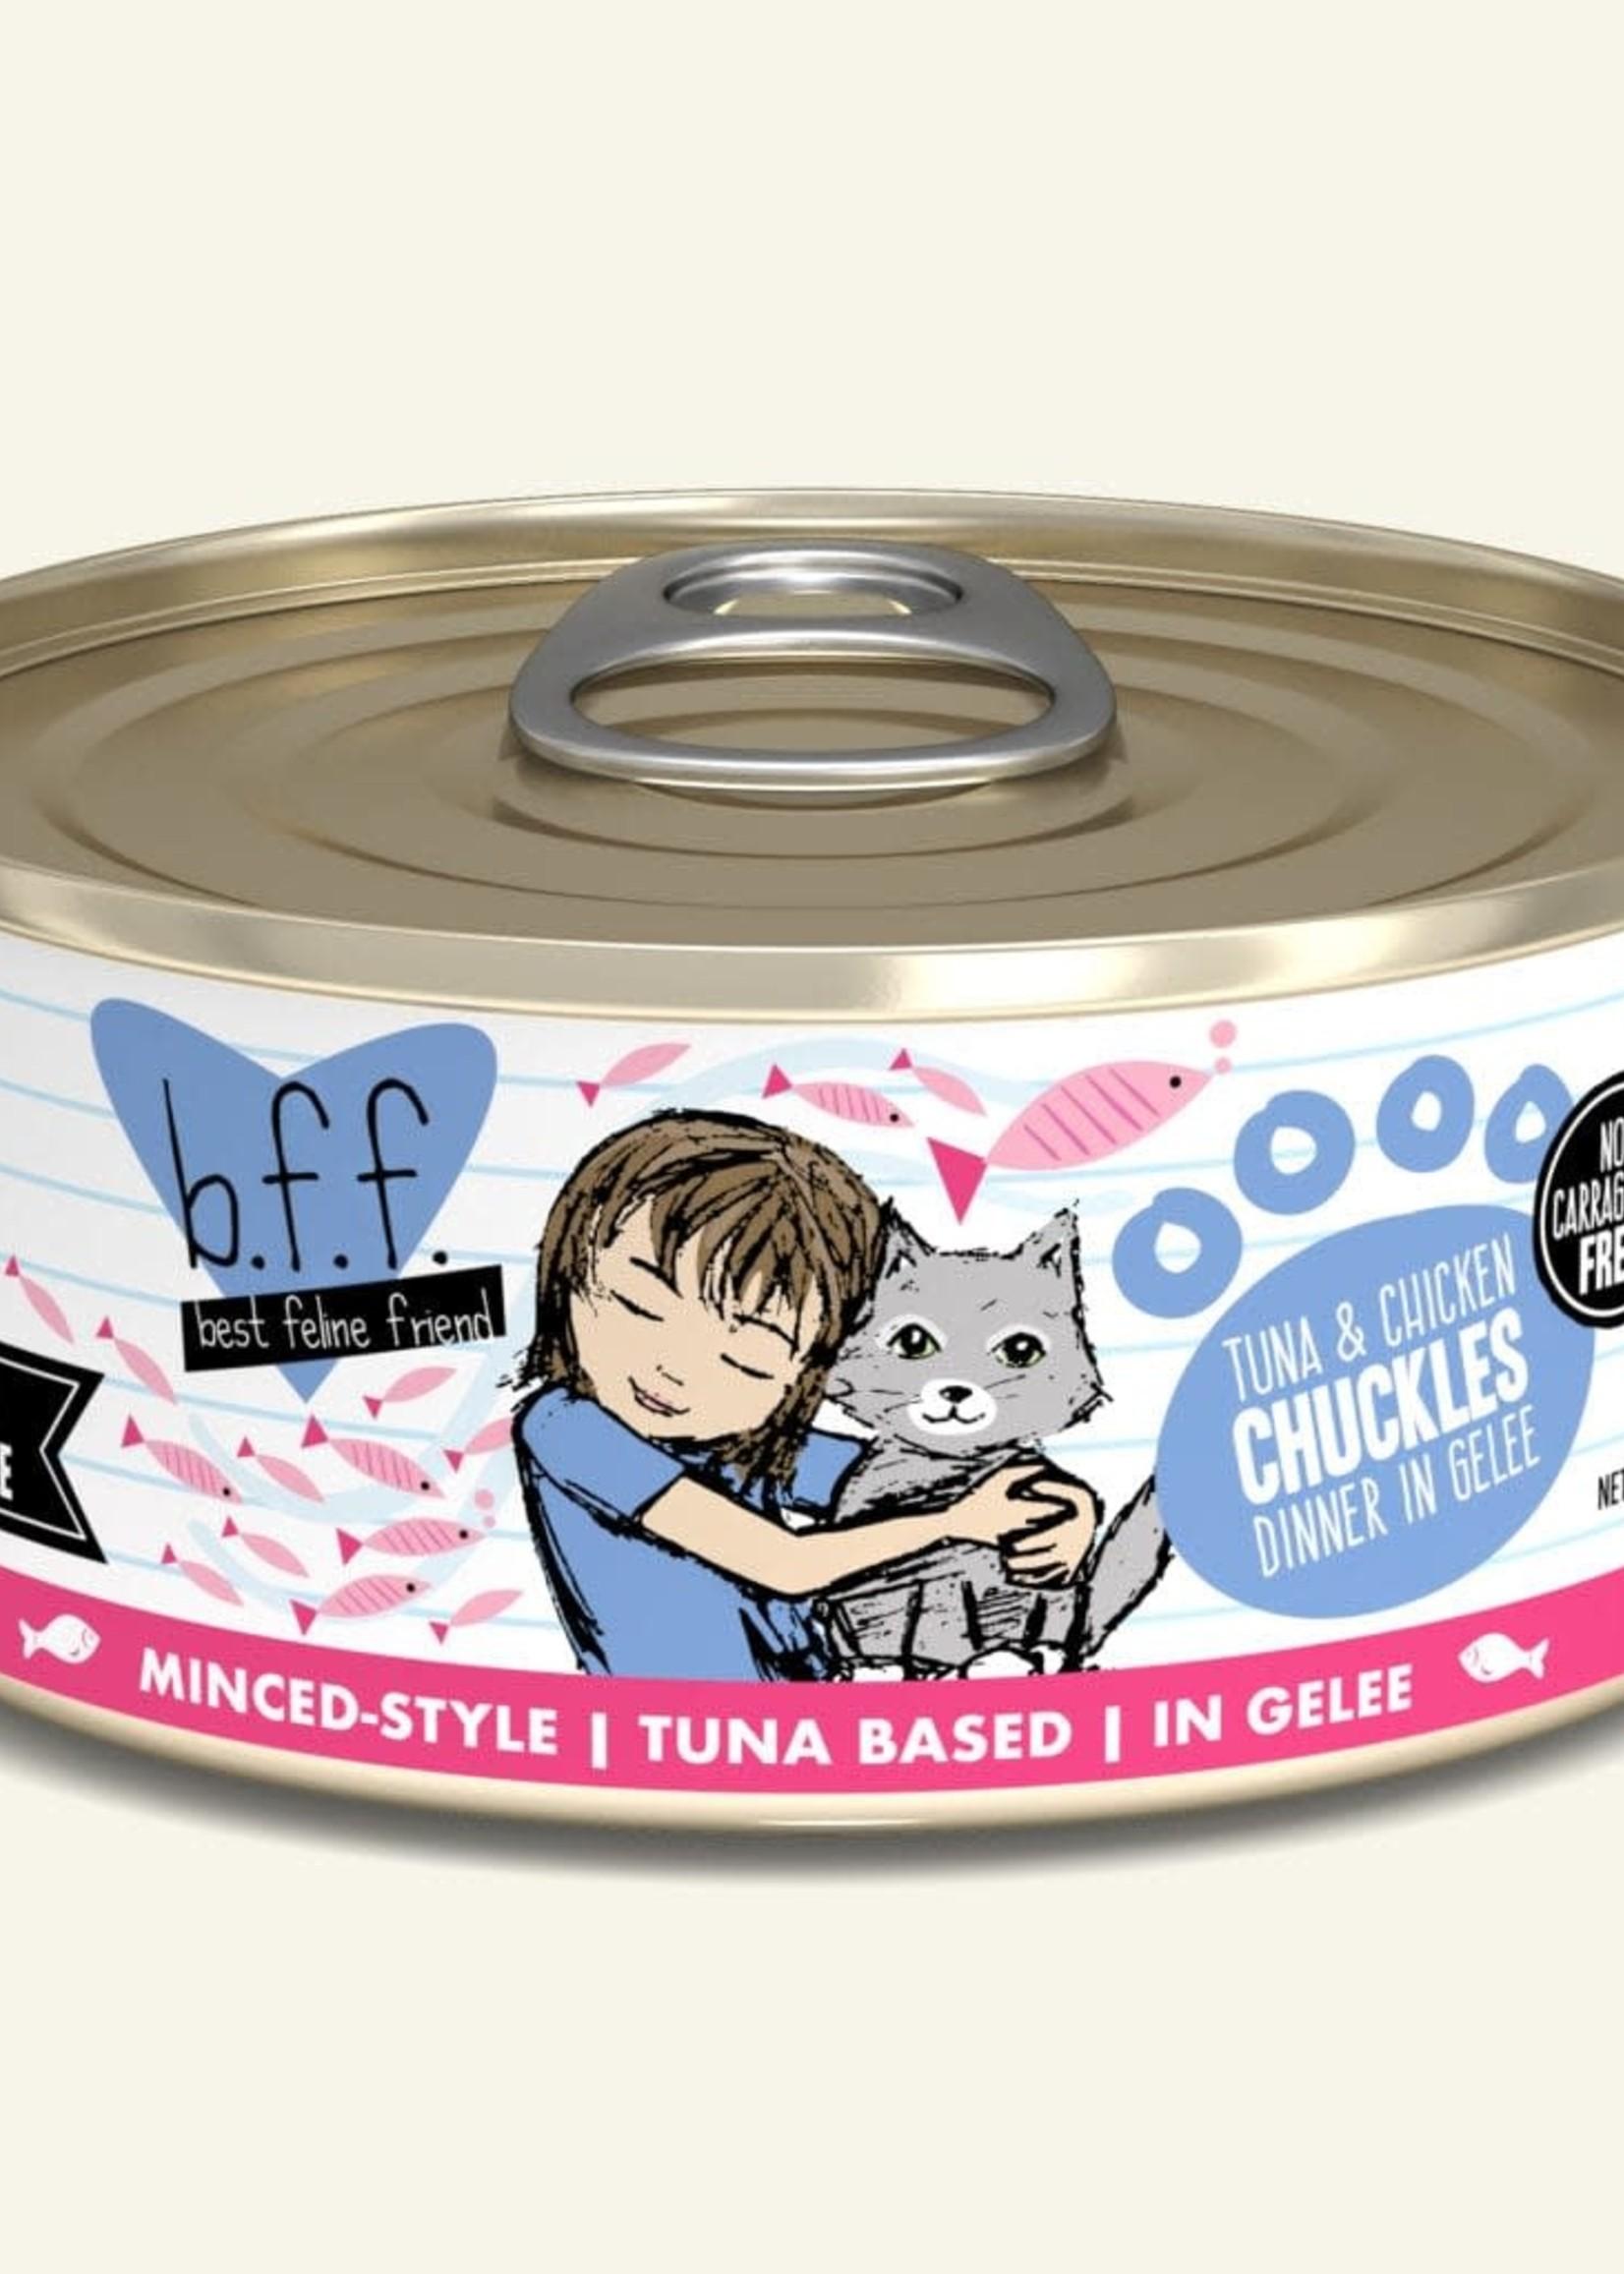 Weruva B.F.F. Tuna & Chicken Chuckles in Gelée Cat 5.5oz Can (Pack of 24)